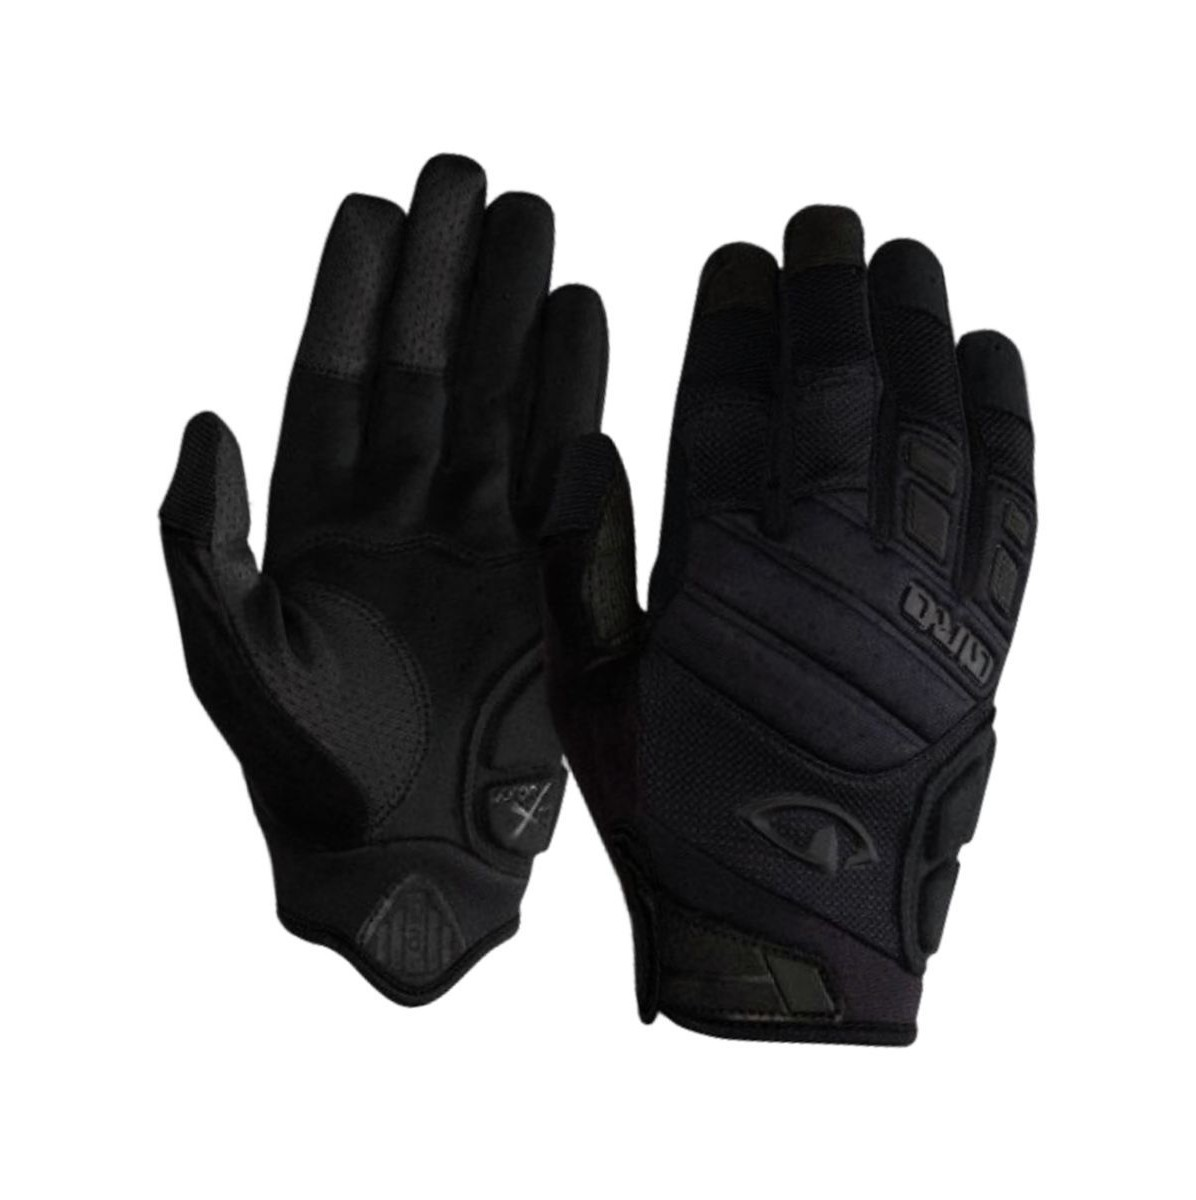 Giro Xen Glove Giro Xen Glove - Black